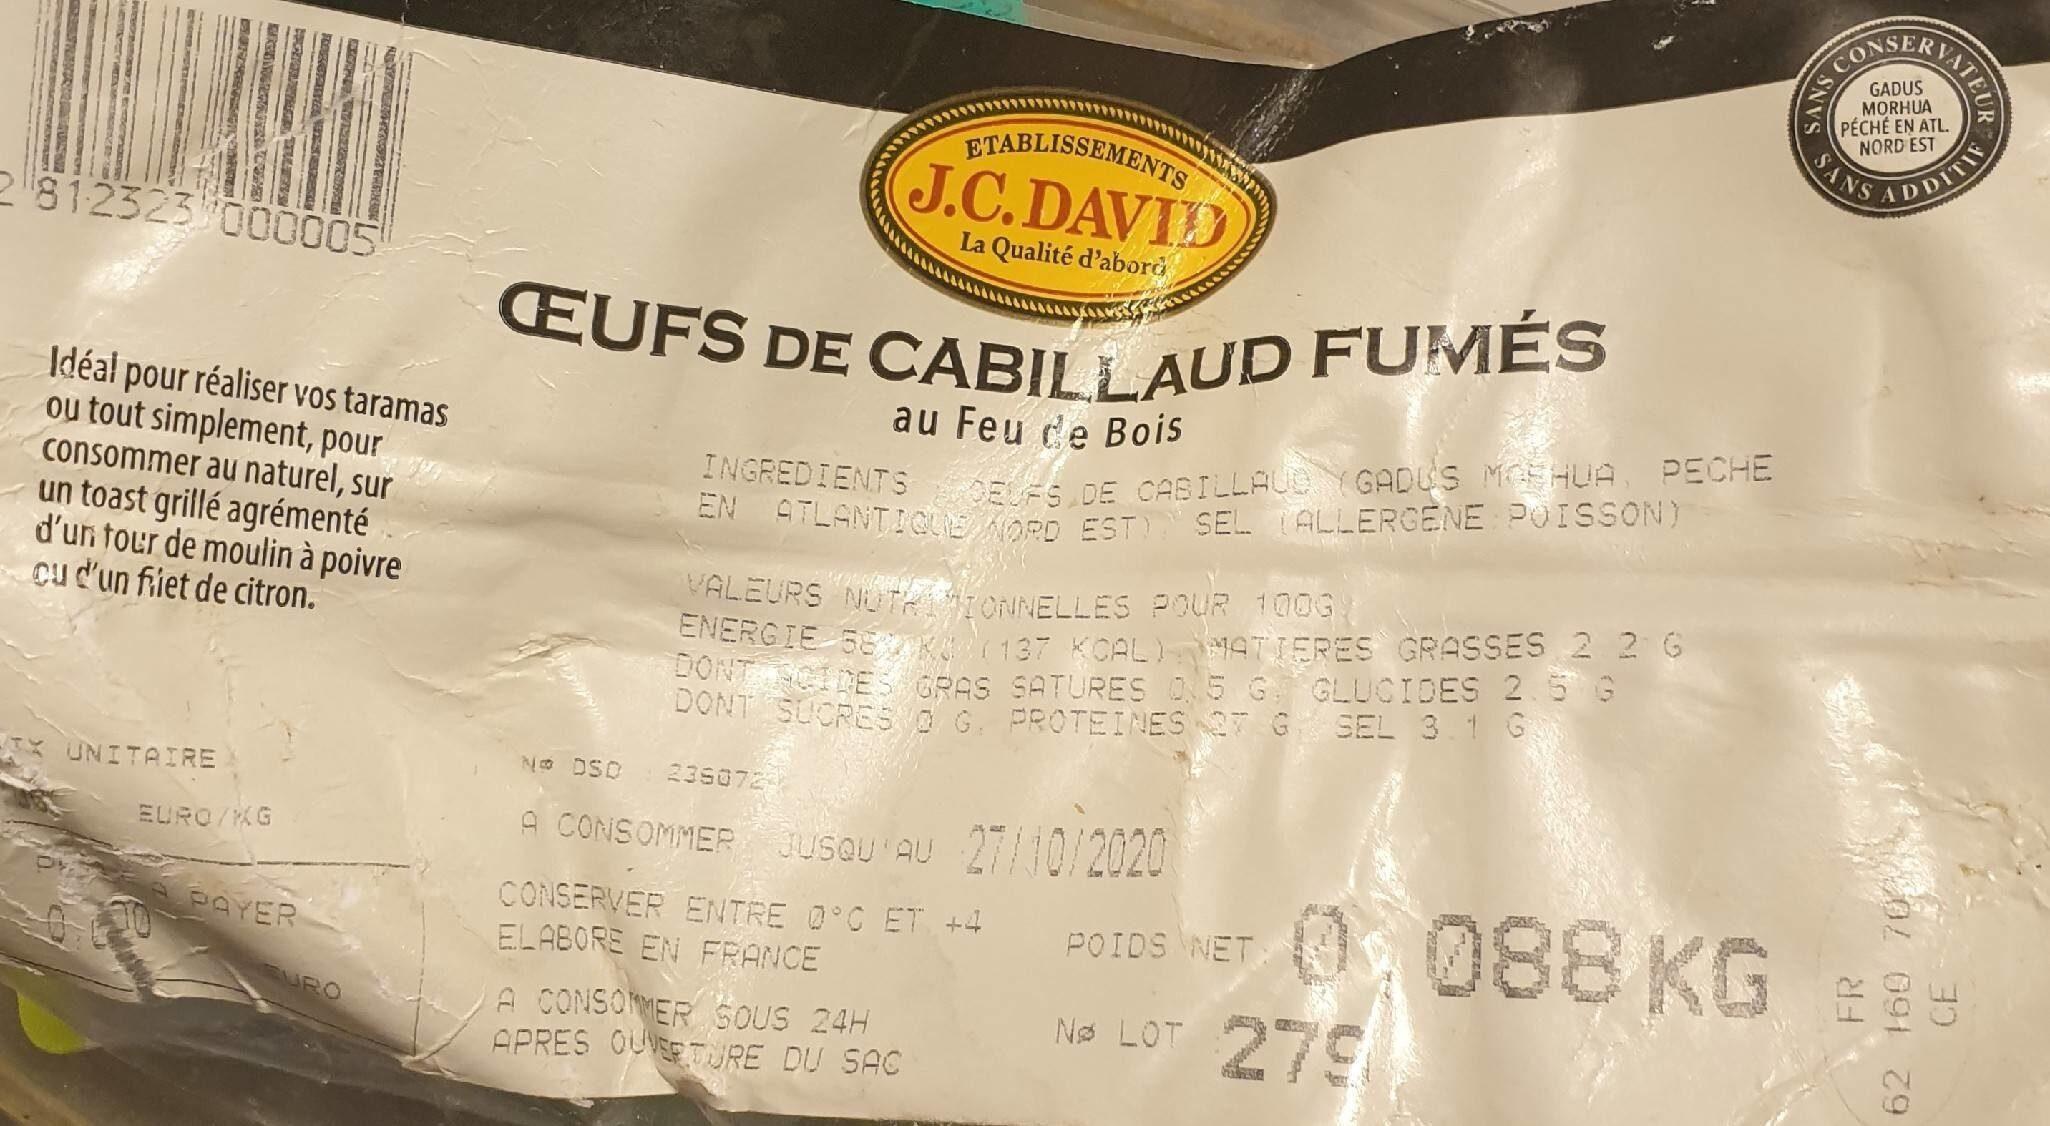 Oeufs de cabillaud fumés - Product - fr